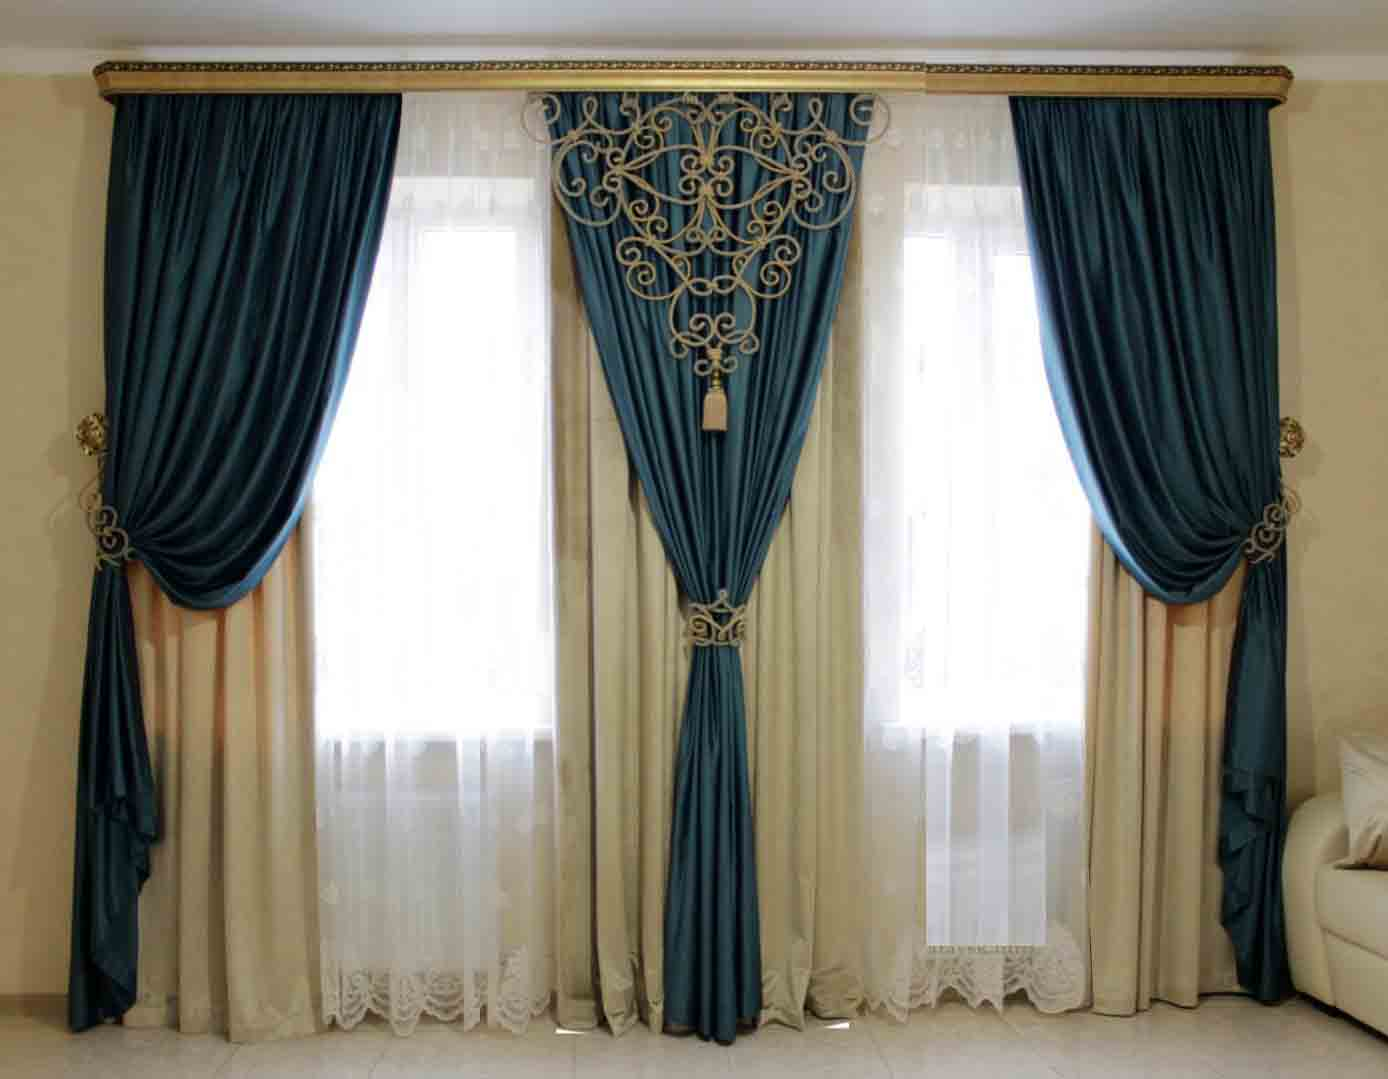 Top 50 curtain design ideas for bedroom modern interior ... on Bedroom Curtain Ideas  id=98977